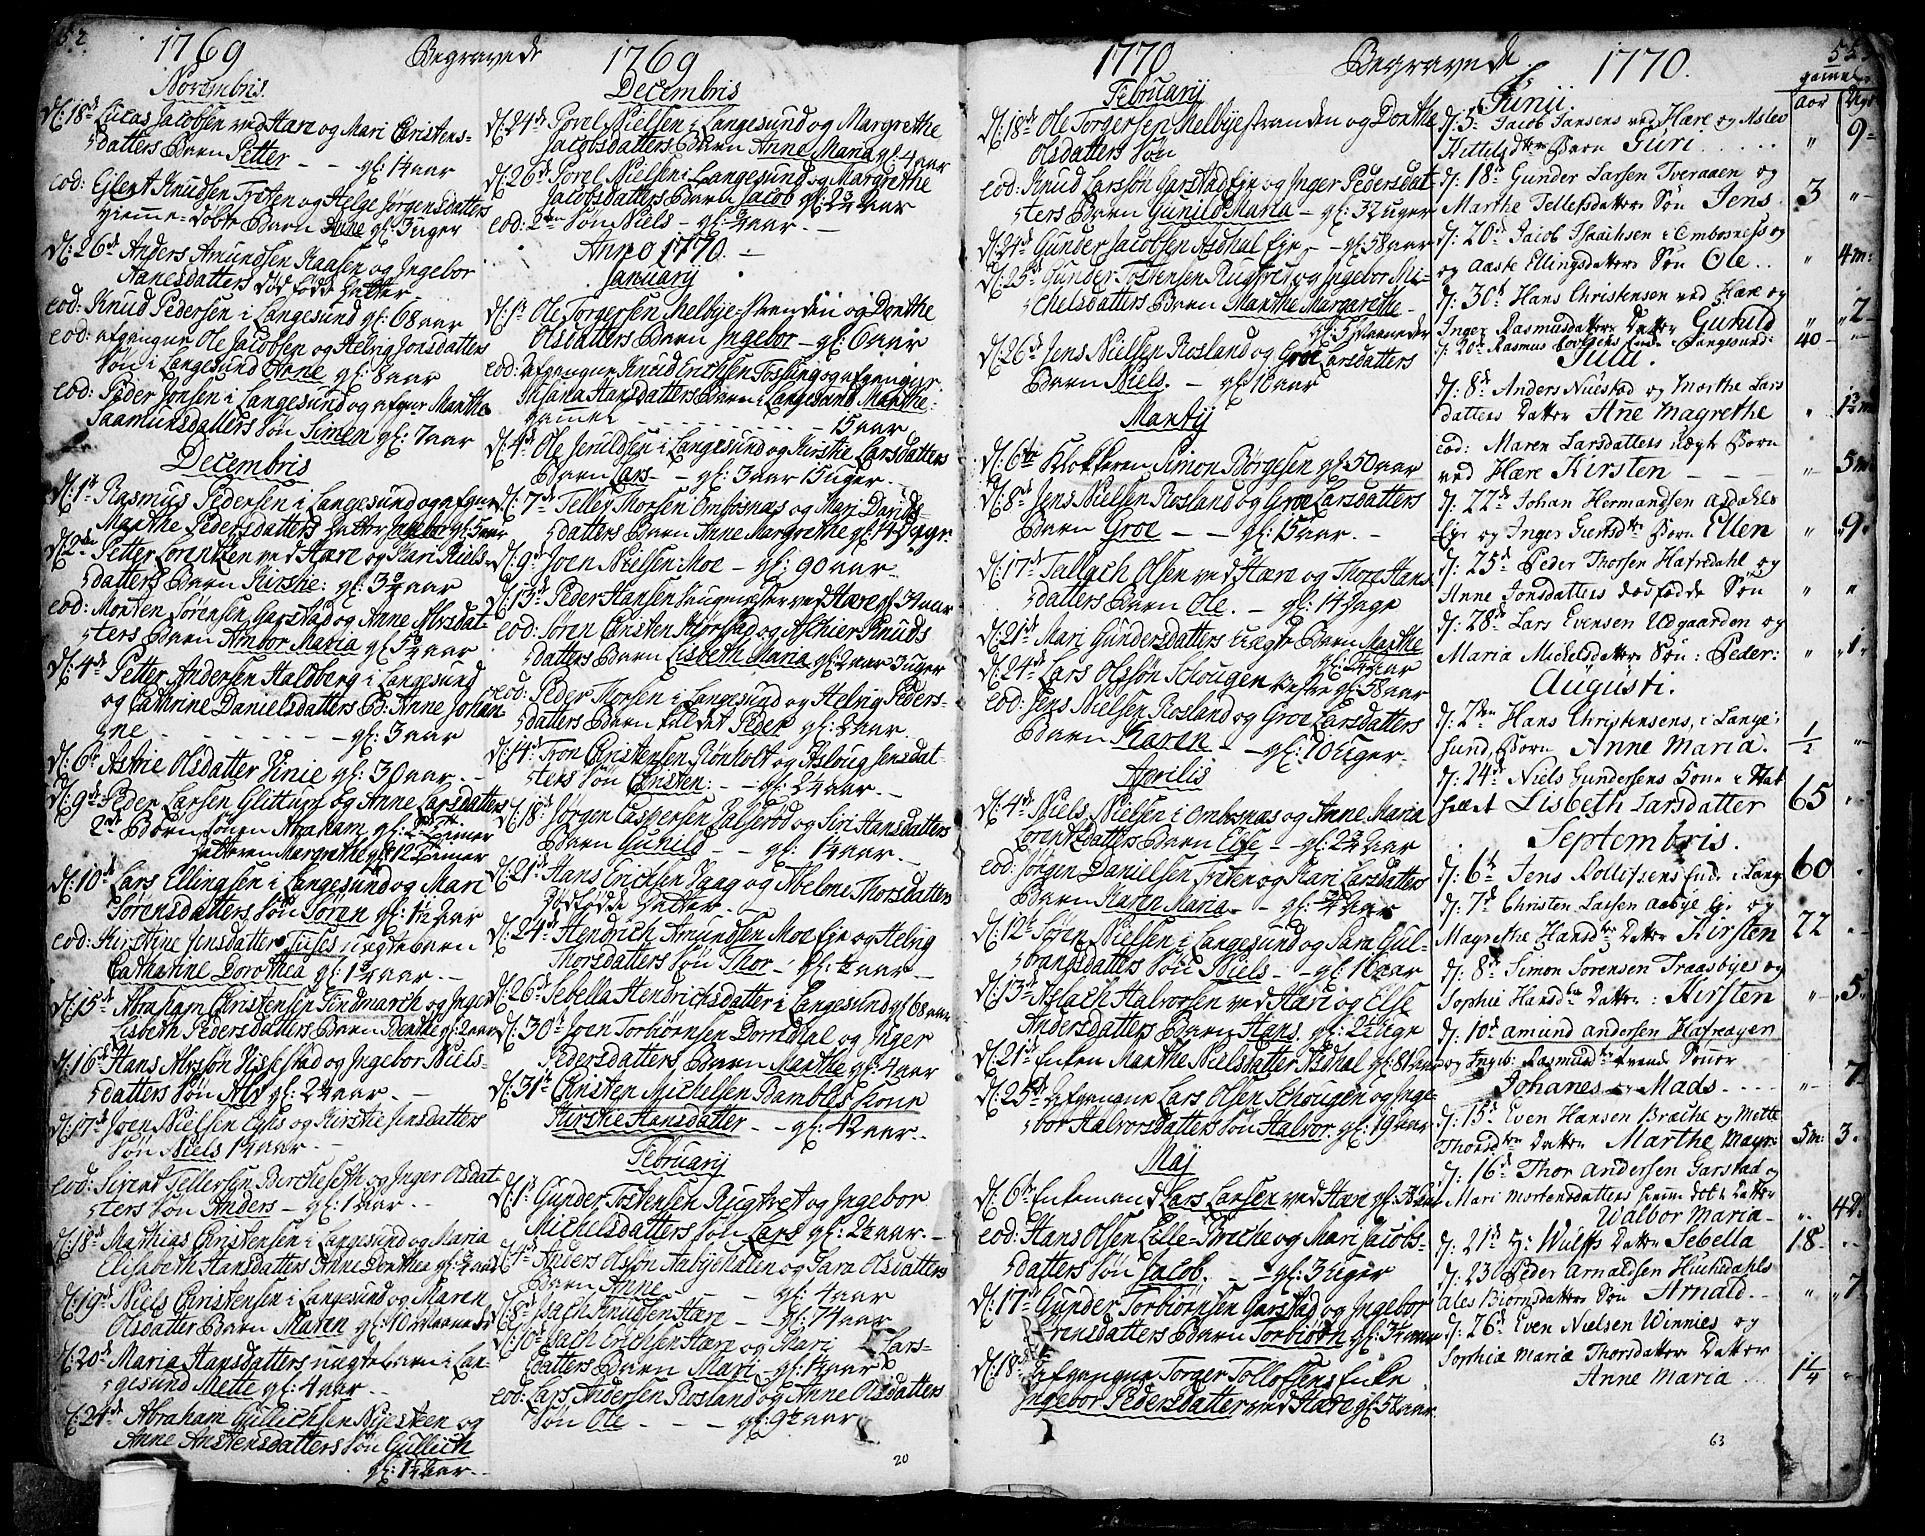 SAKO, Bamble kirkebøker, F/Fa/L0001: Ministerialbok nr. I 1, 1702-1774, s. 552-553